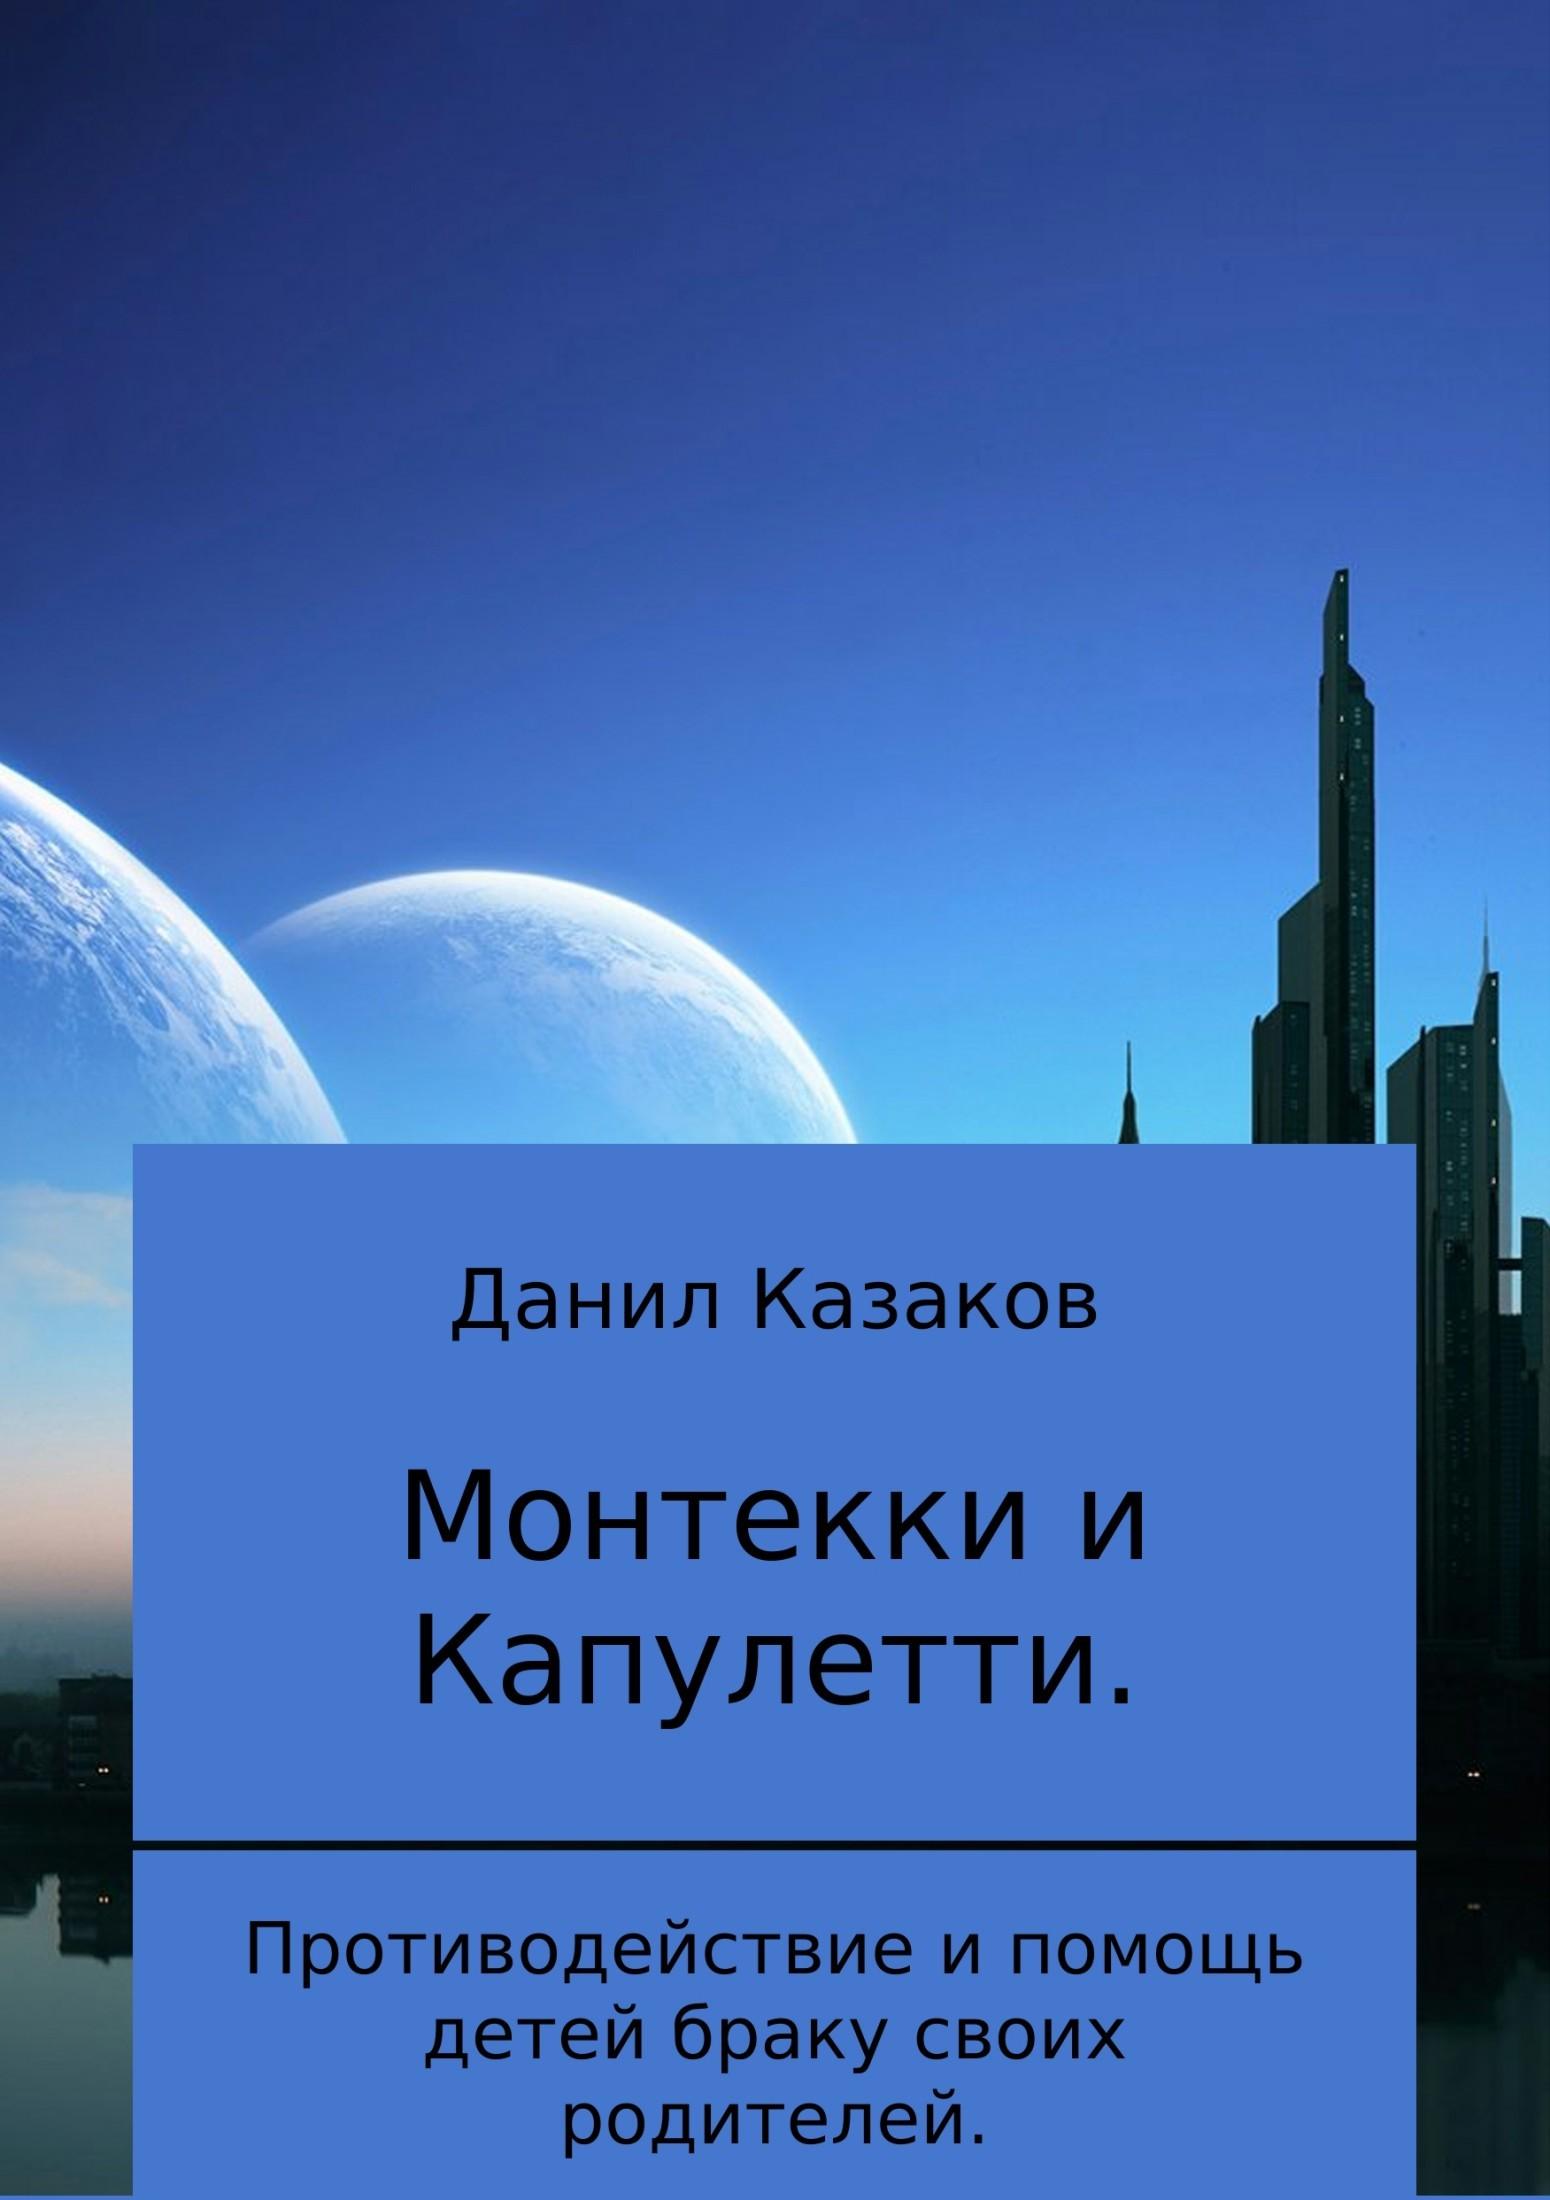 Данил Васильевич Казаков Монтекки и Капулетти данил васильевич казаков монтекки и капулетти